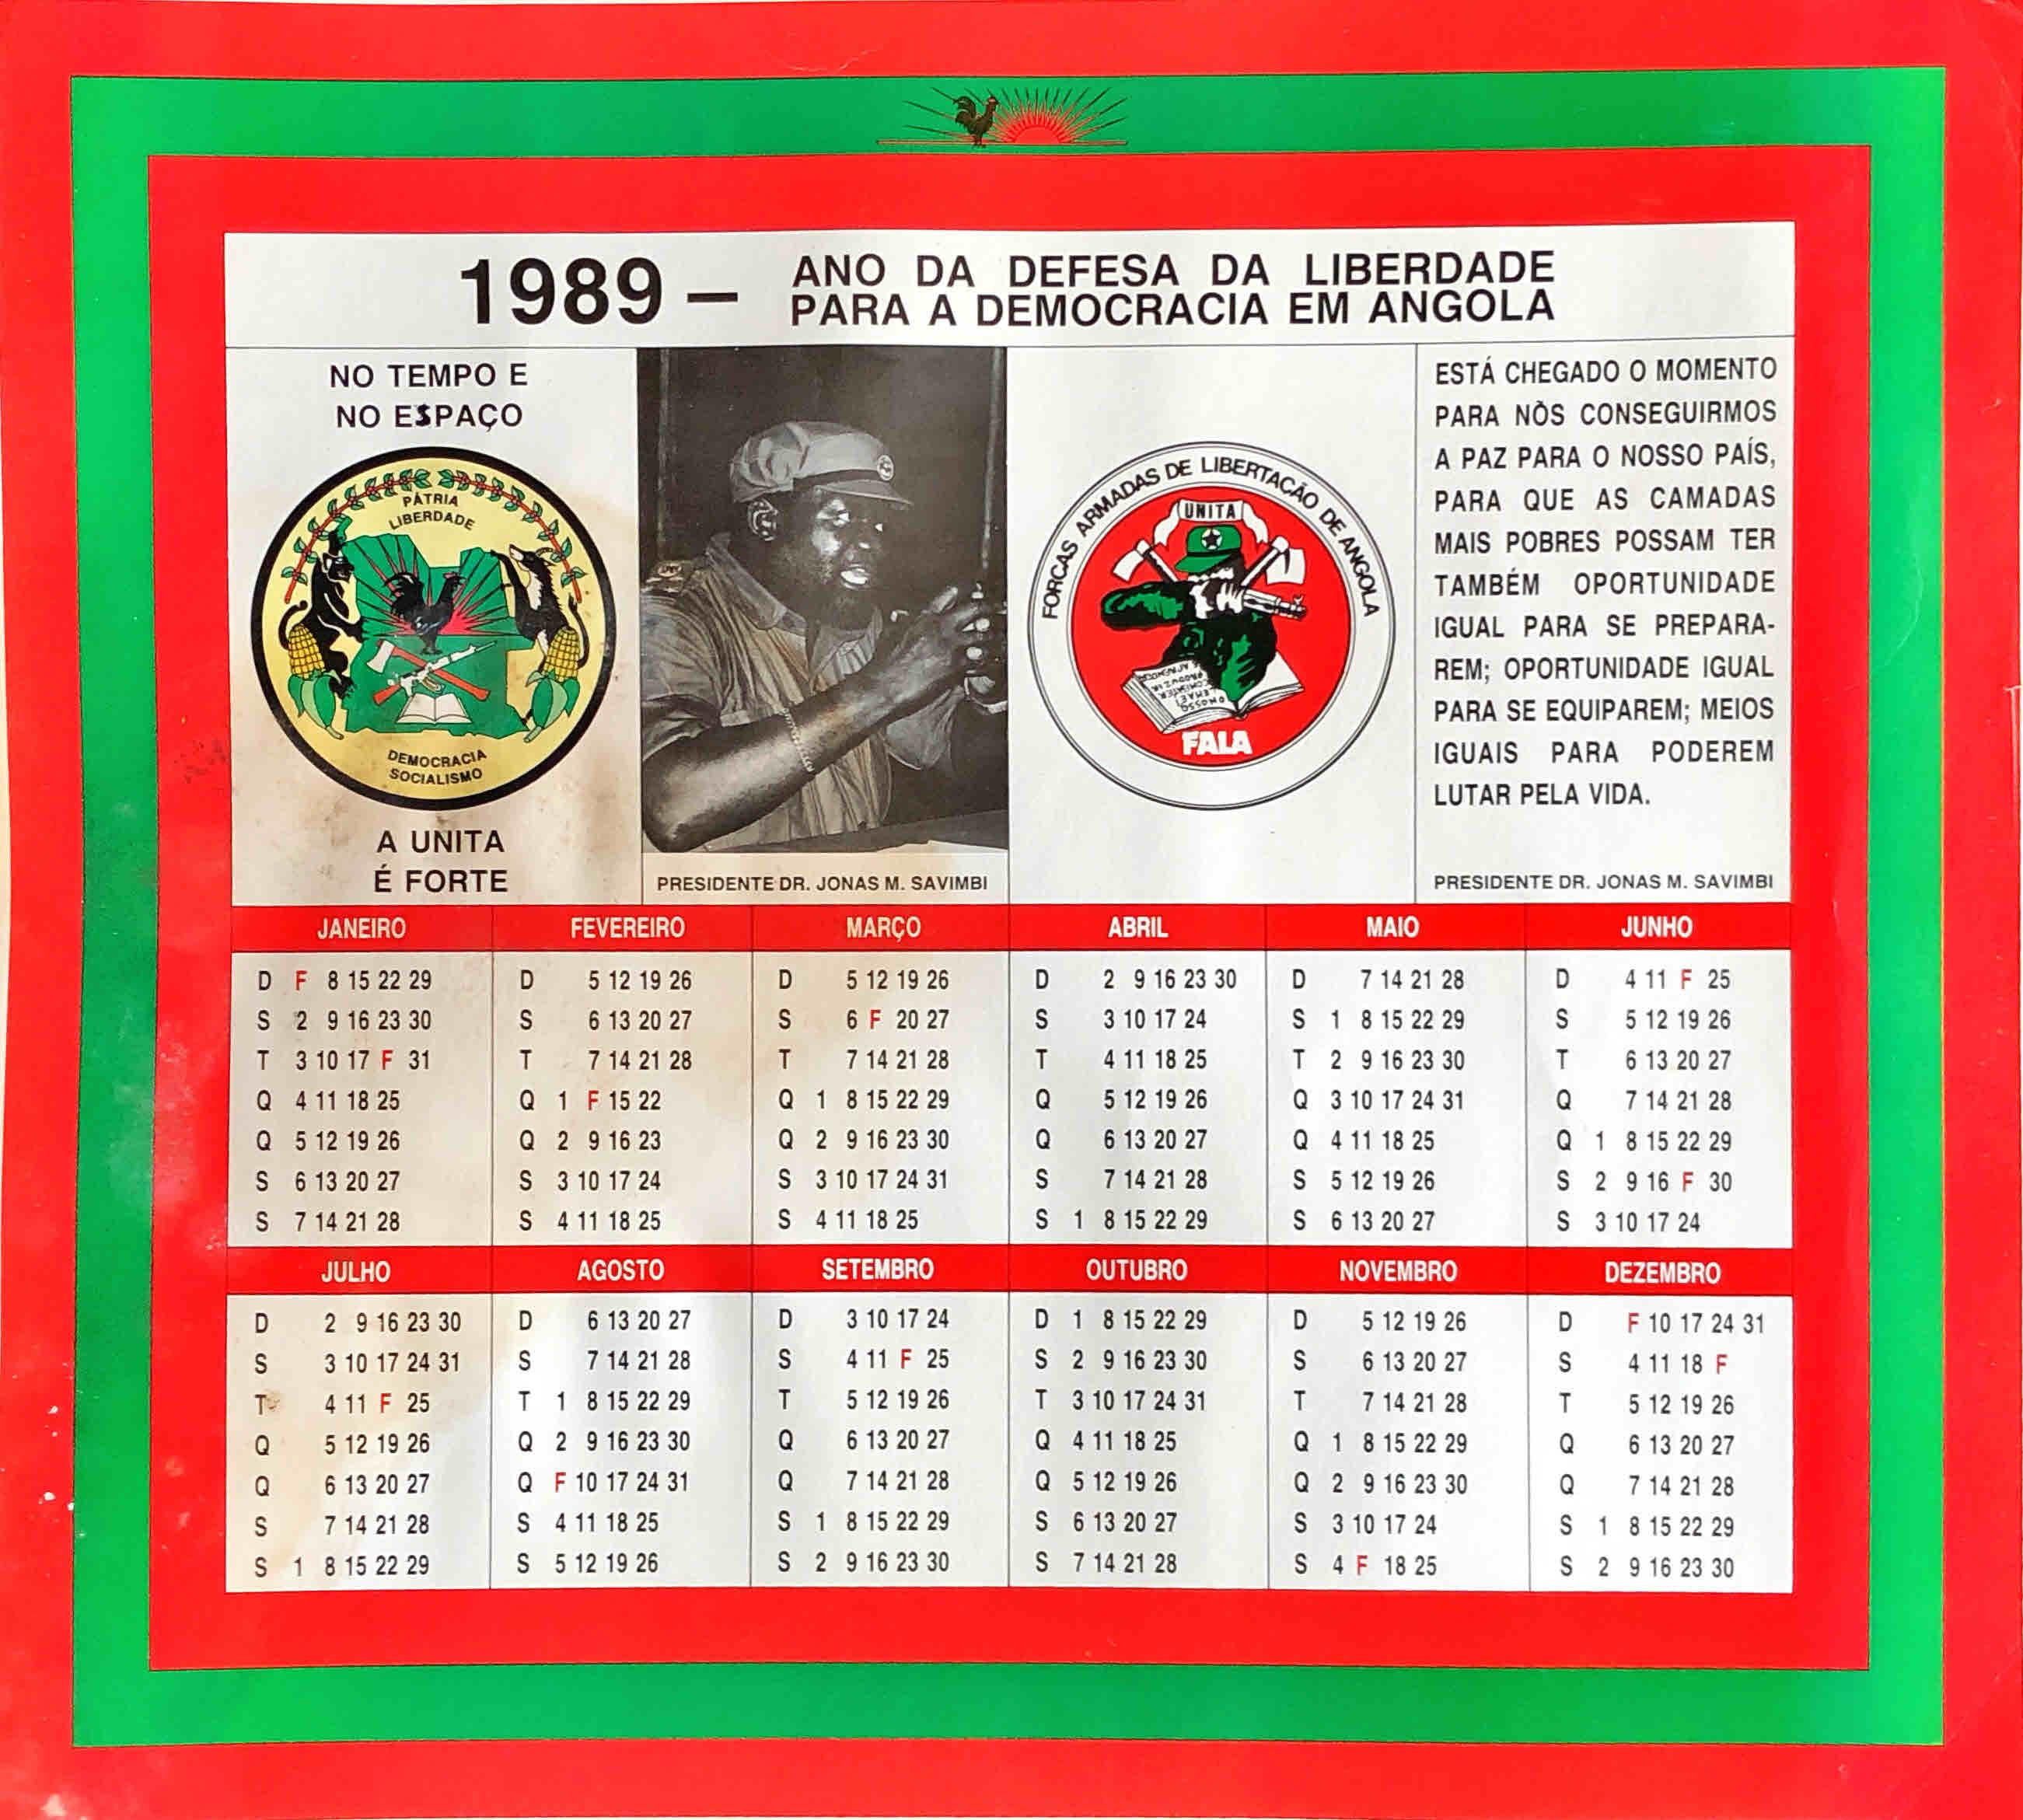 Angola unita 1989 ephemera biblioteca e arquivo de jos carregue aqui para imprimir opens in new window fandeluxe Choice Image